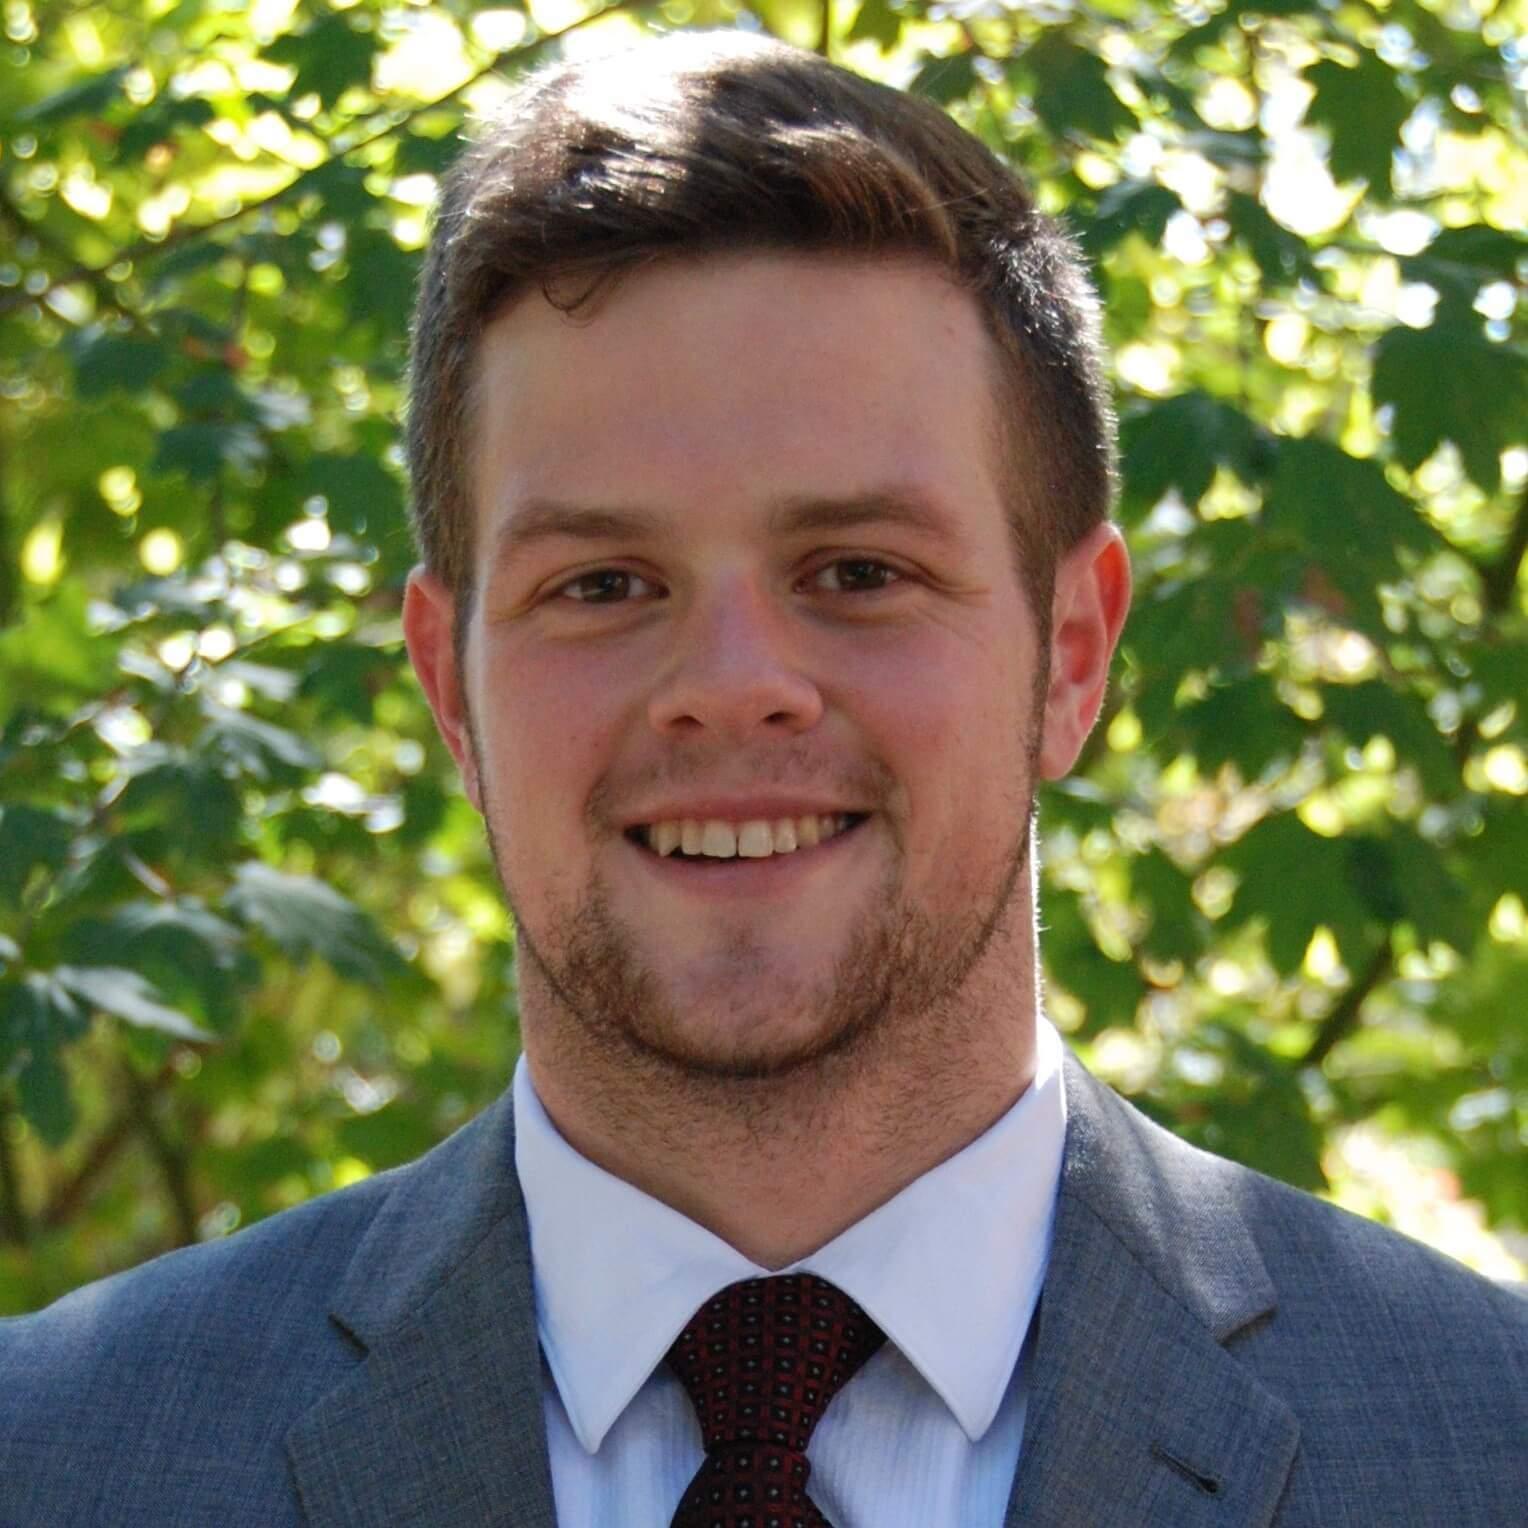 Justin David : Graduate Student